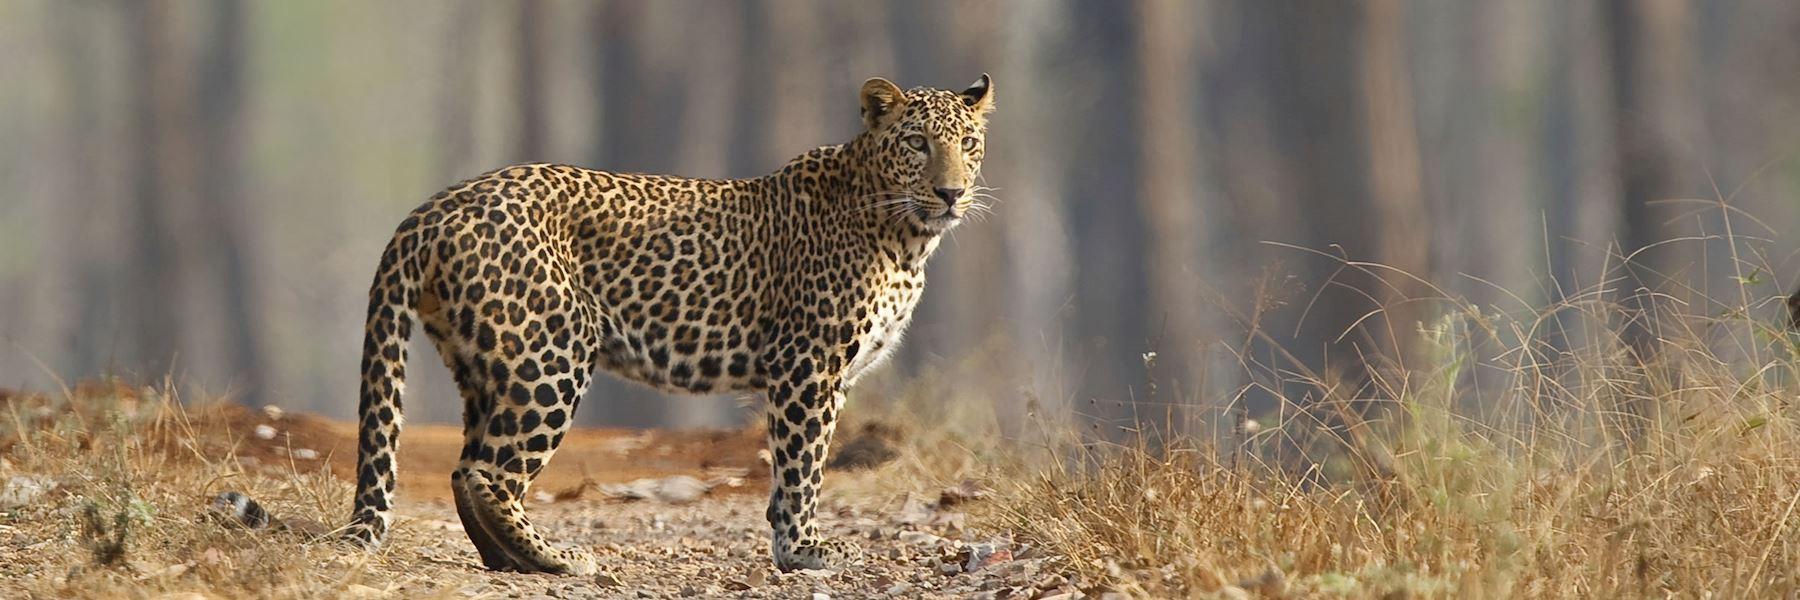 Visit Nagarhole National Park, India